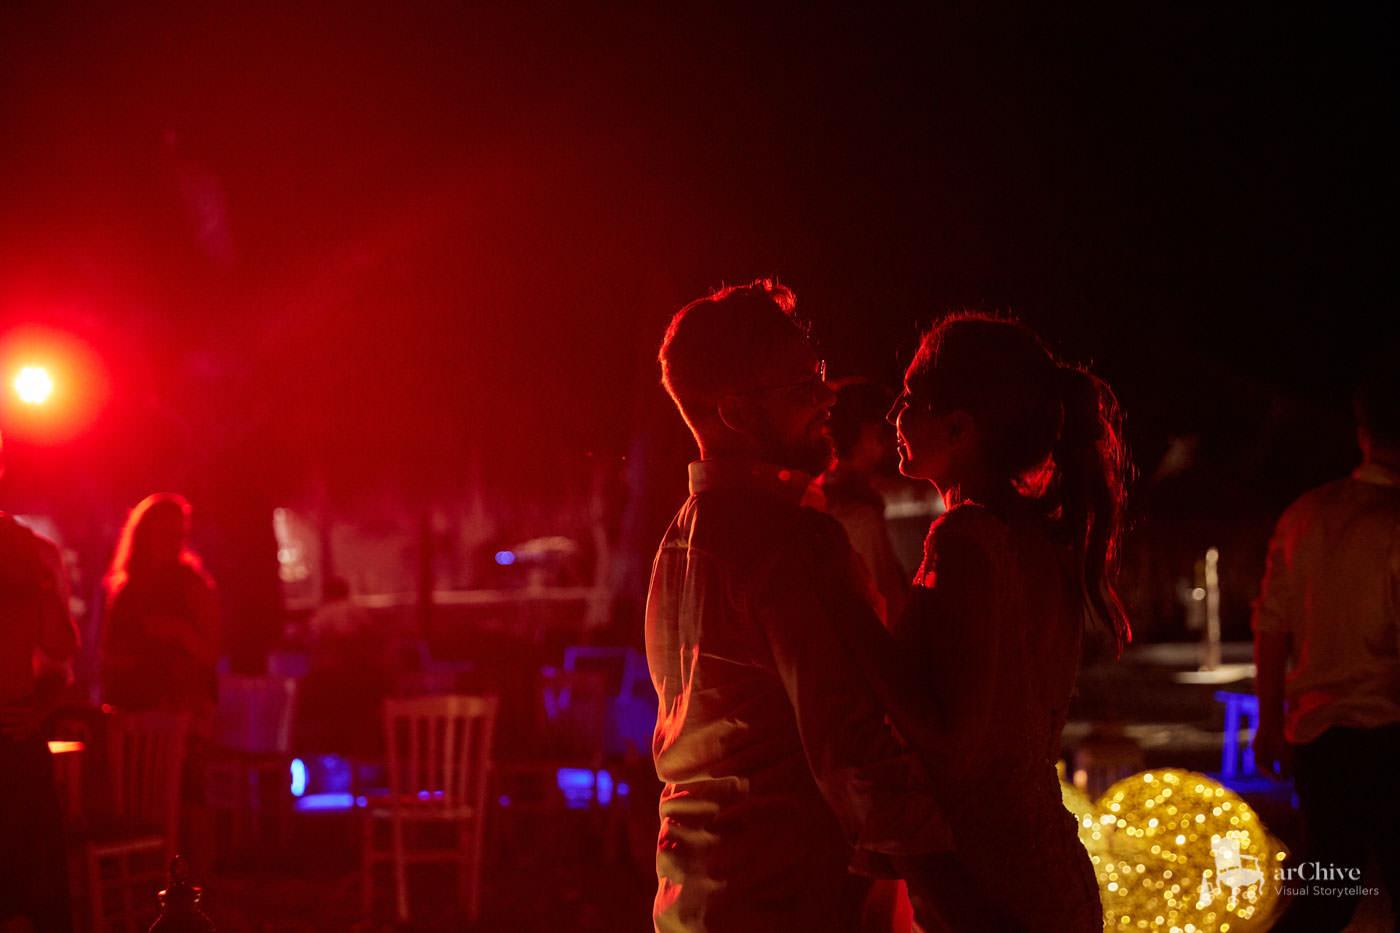 10974-wedding-photographer-spetses-greece.jpg